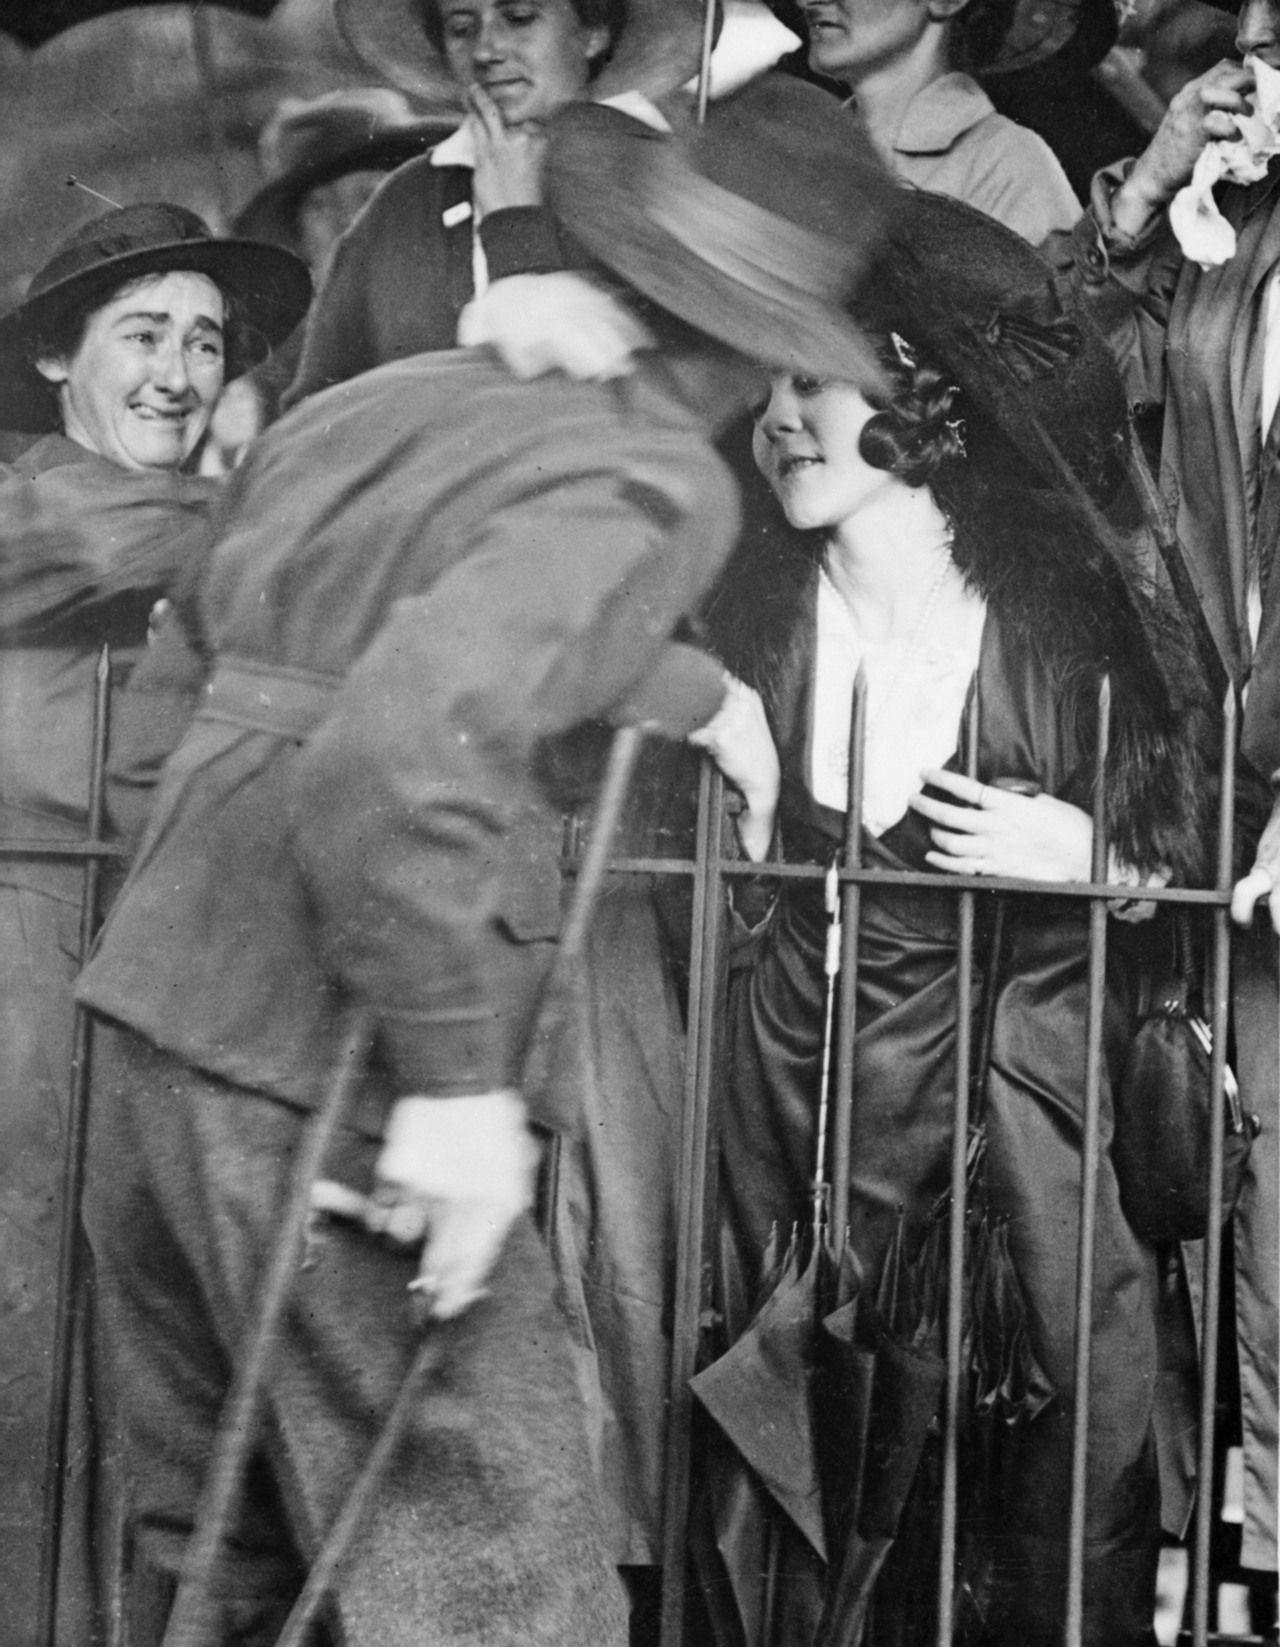 Welcome home soldier - 1919 Sydney, Australia